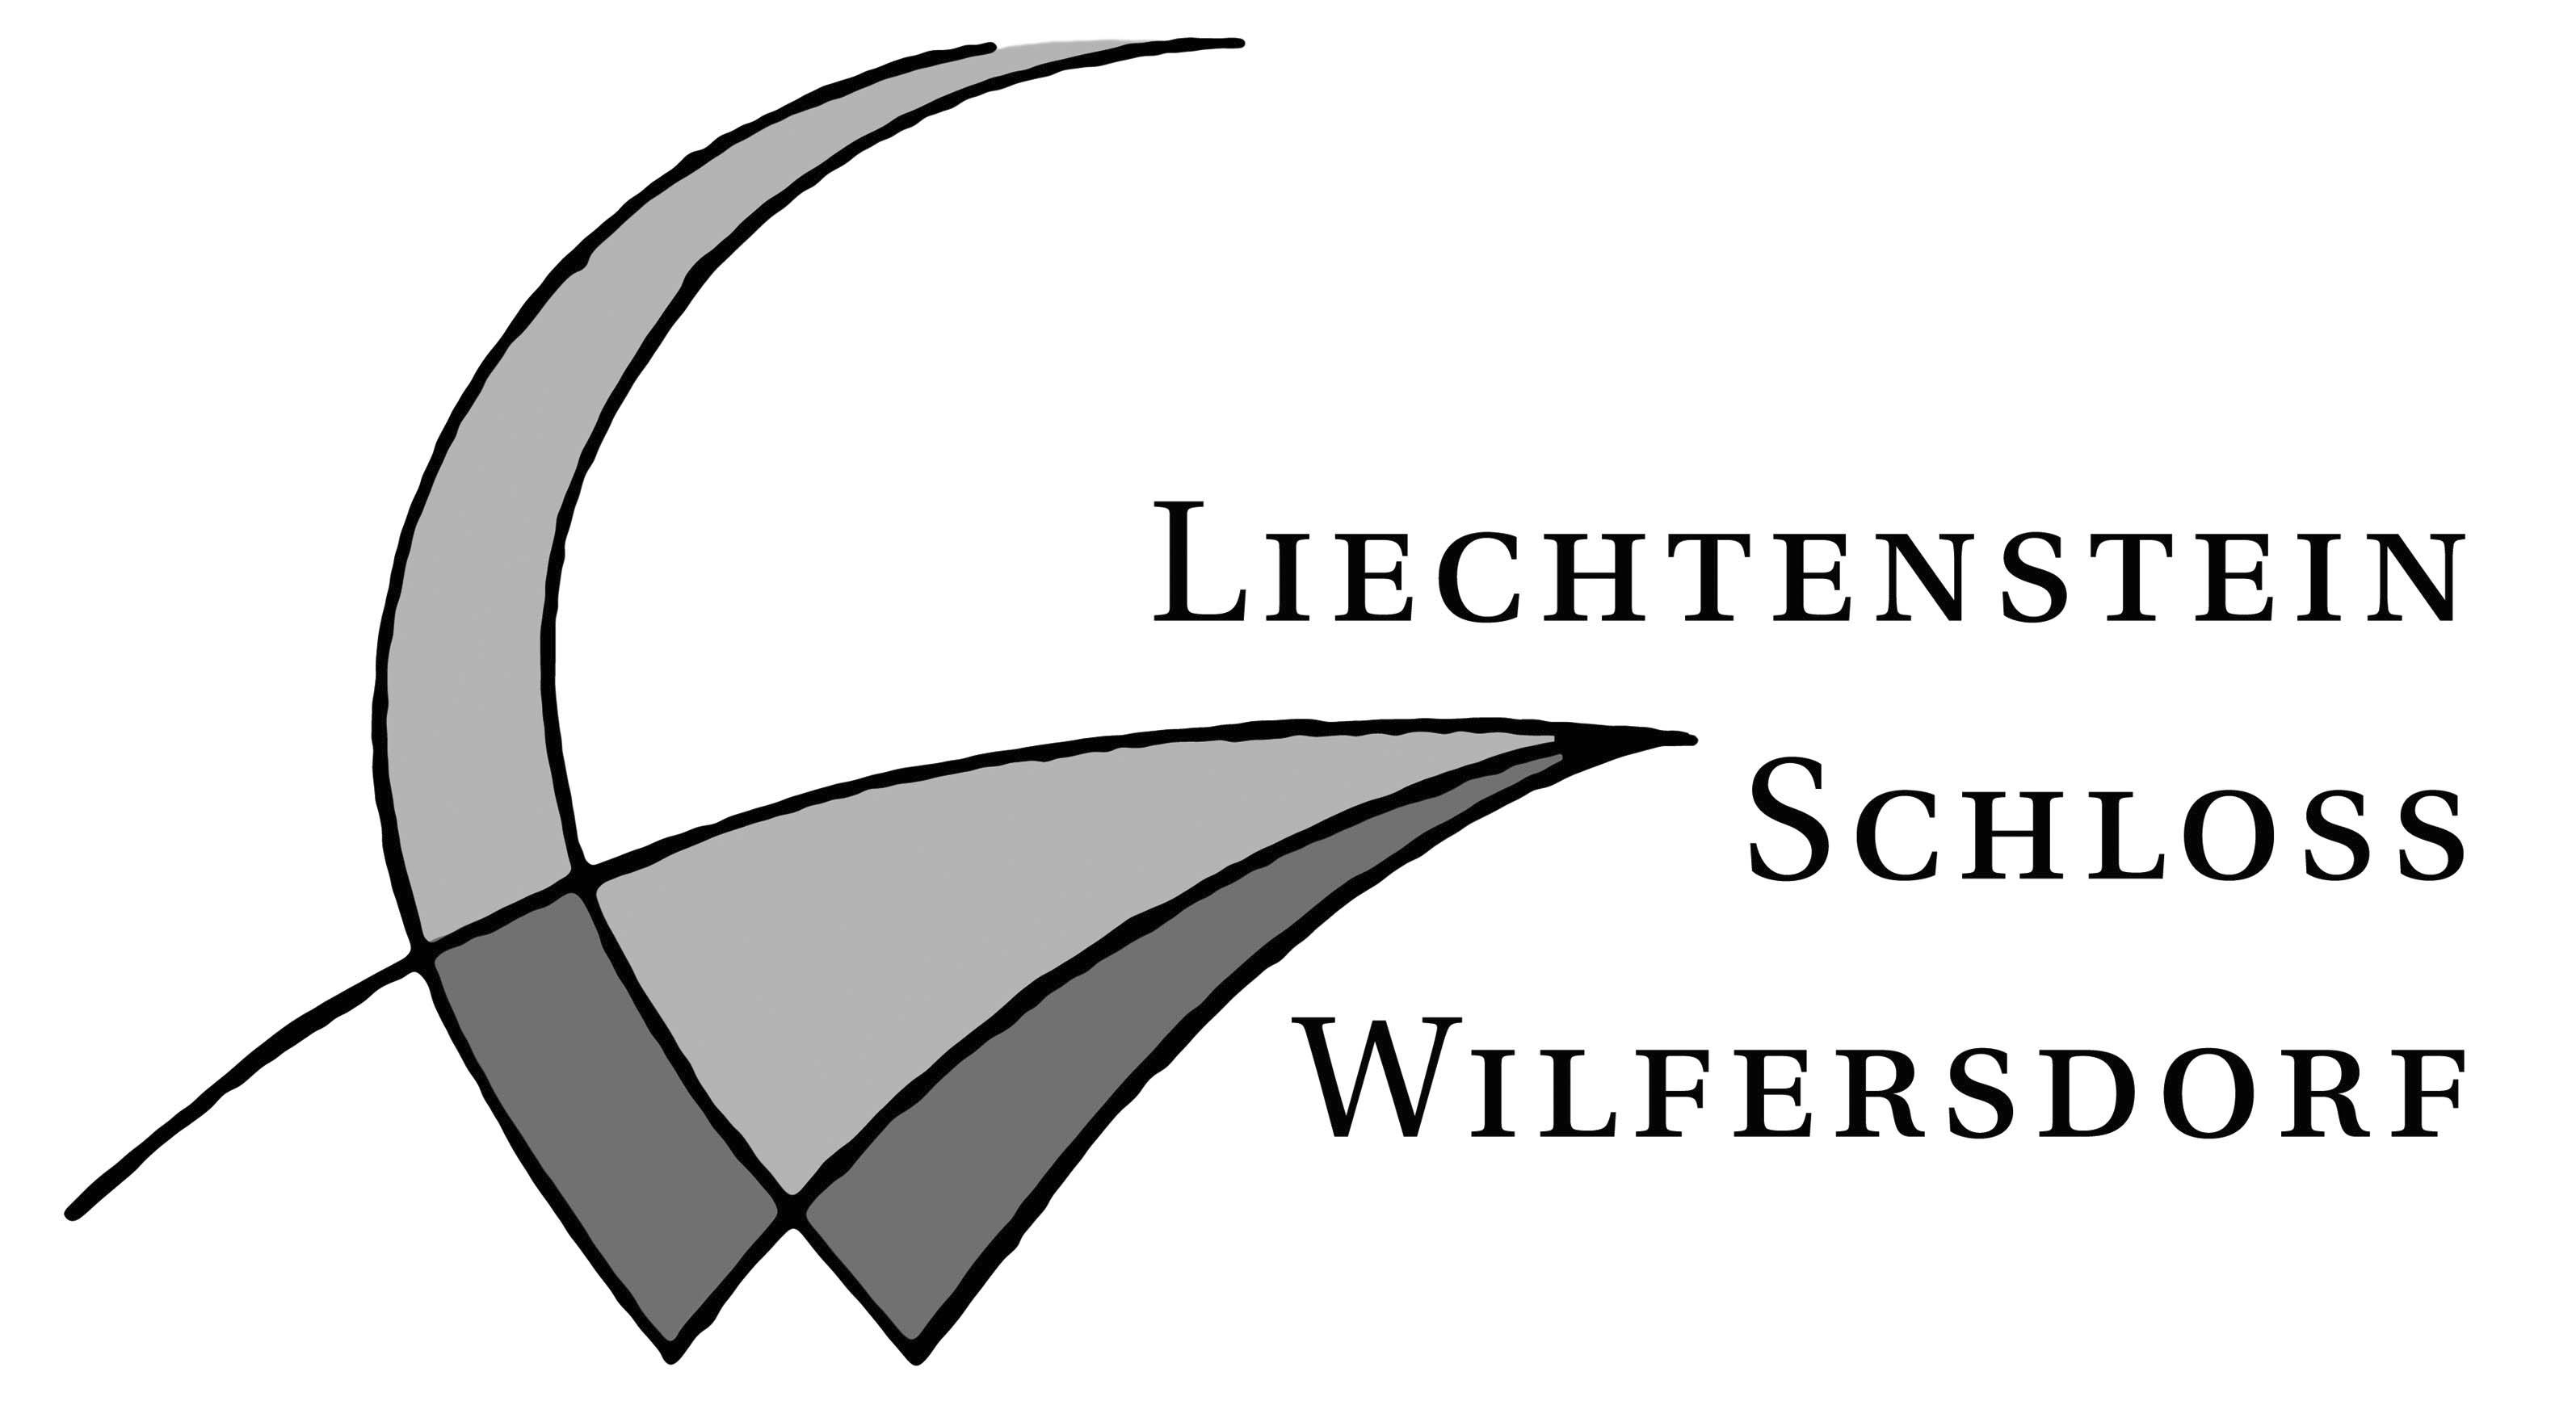 Zámek Liechtenstein Wilfersdorf